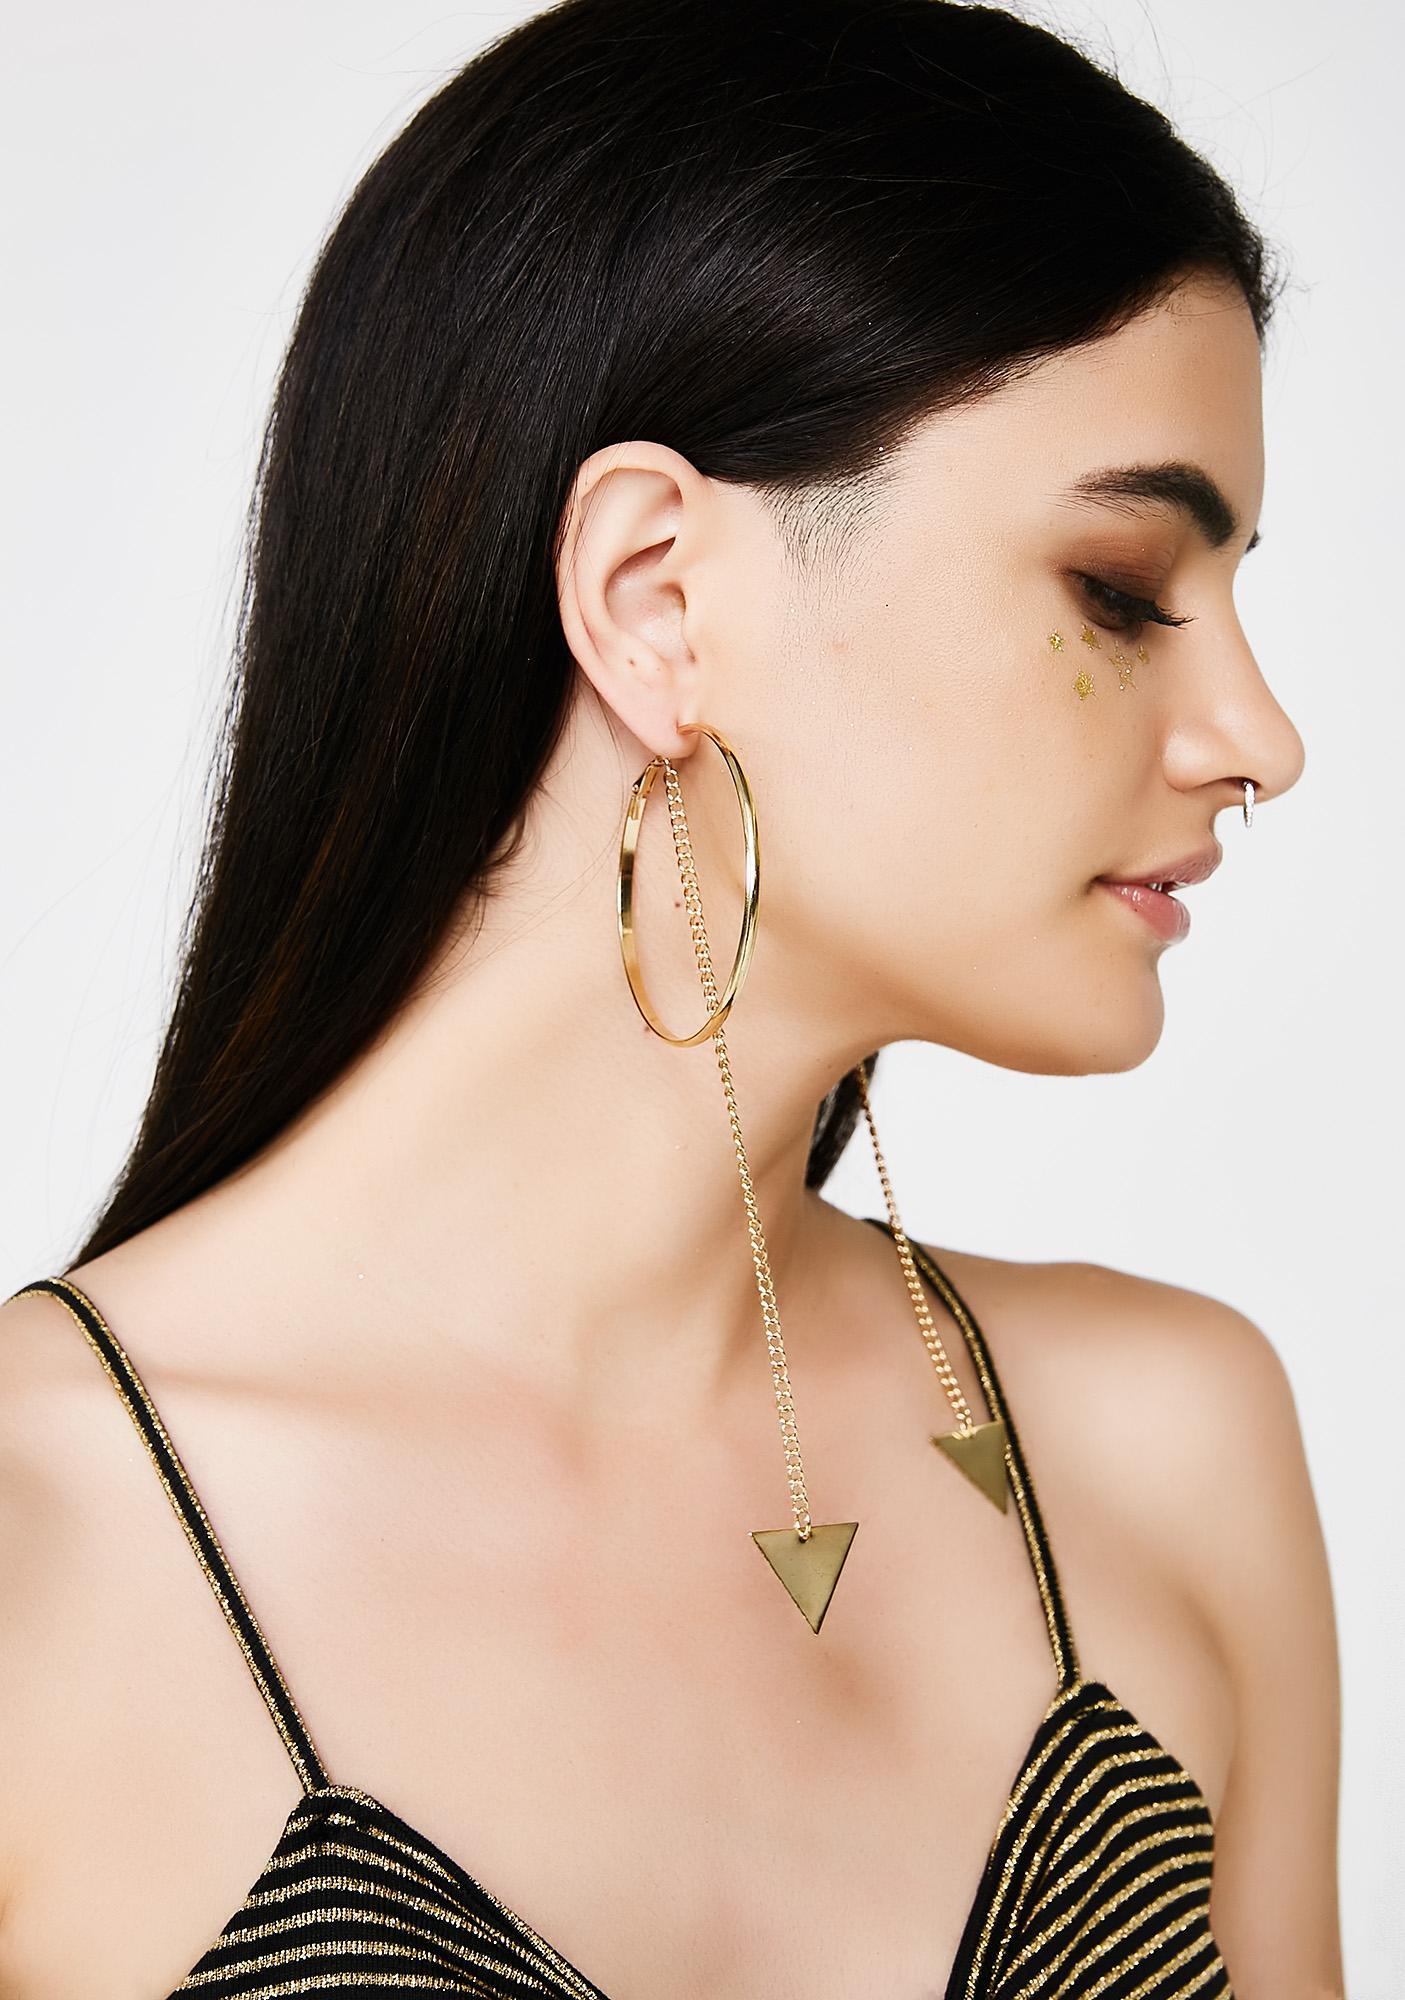 Hold The Chain Hoop Earrings